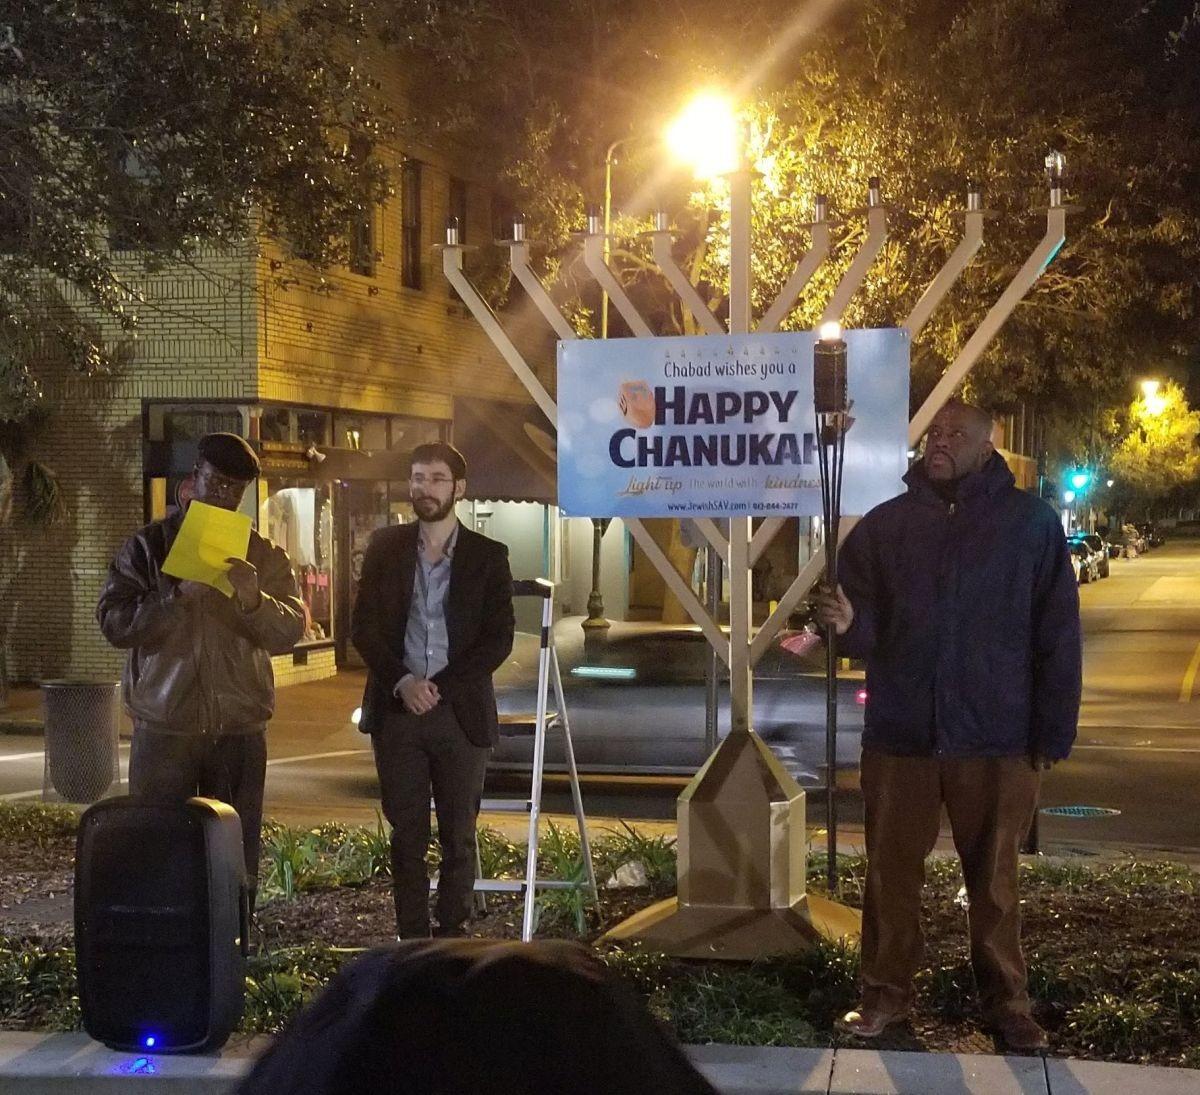 Savannah Mayor Van Johnson (right) participates in the 2017 menorah-lighting ceremony in Ellis Square during Chanukah 2017.